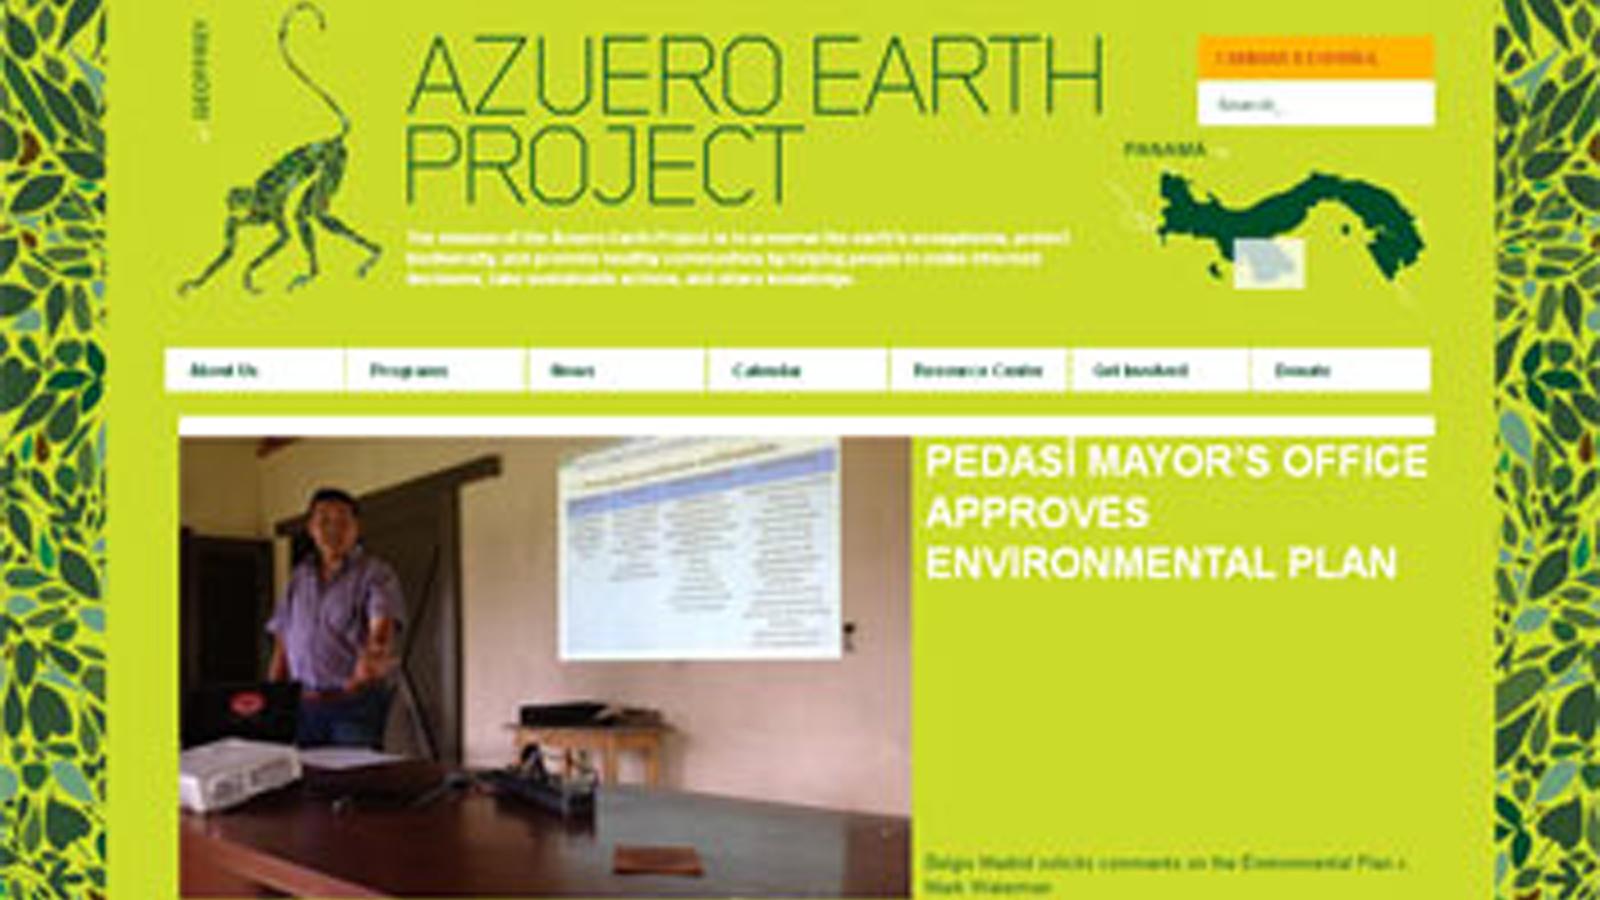 AzueroEarthProjectWebsite_Feature_02_CourtesyEdwinavonGal.jpg